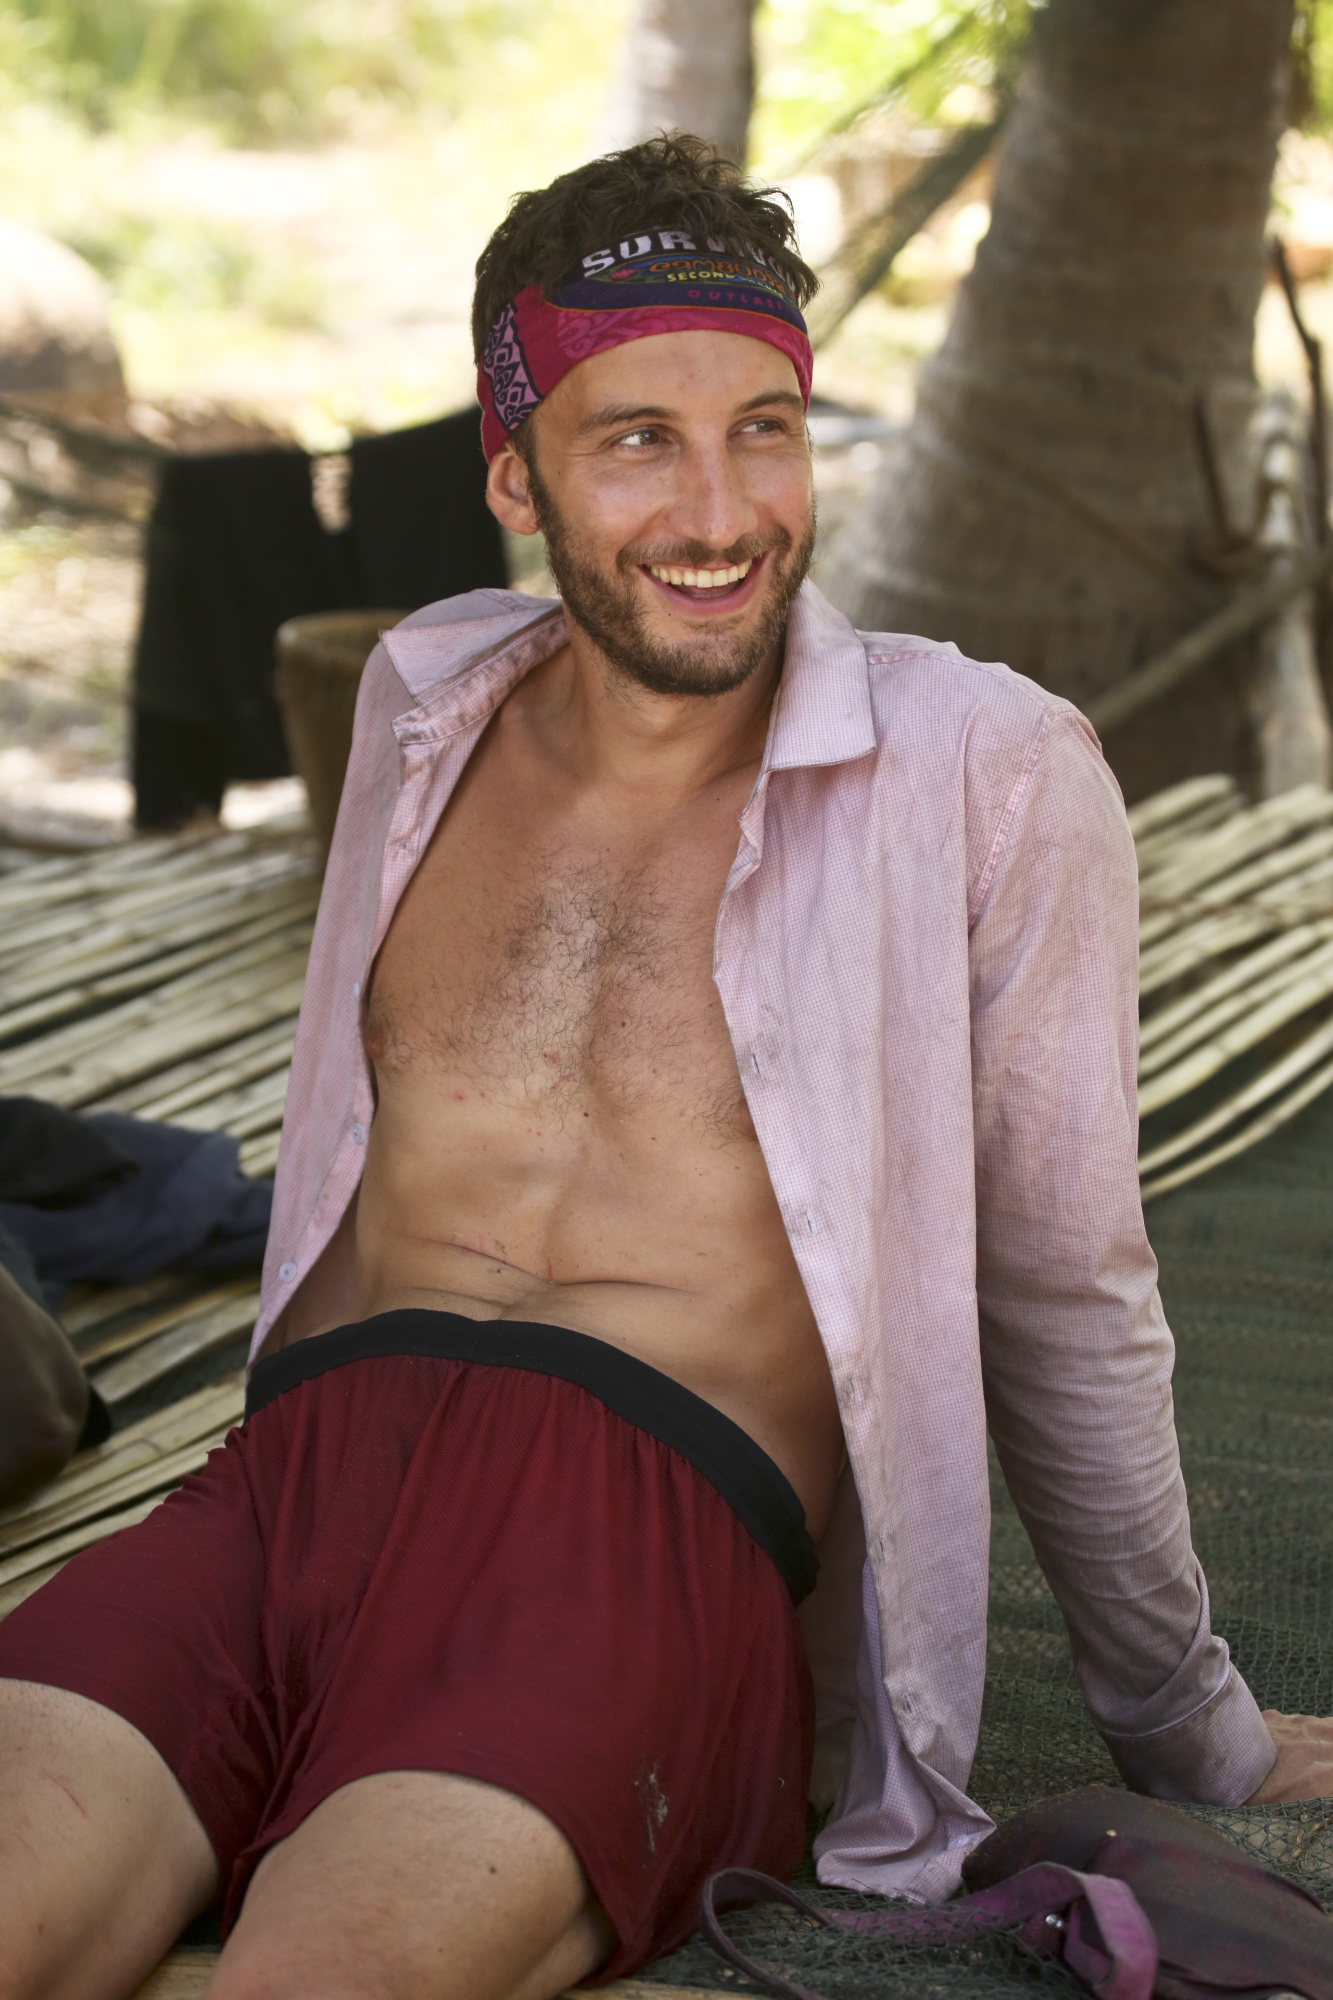 Stephen Fishbach in camp on Survivor: Second Chance